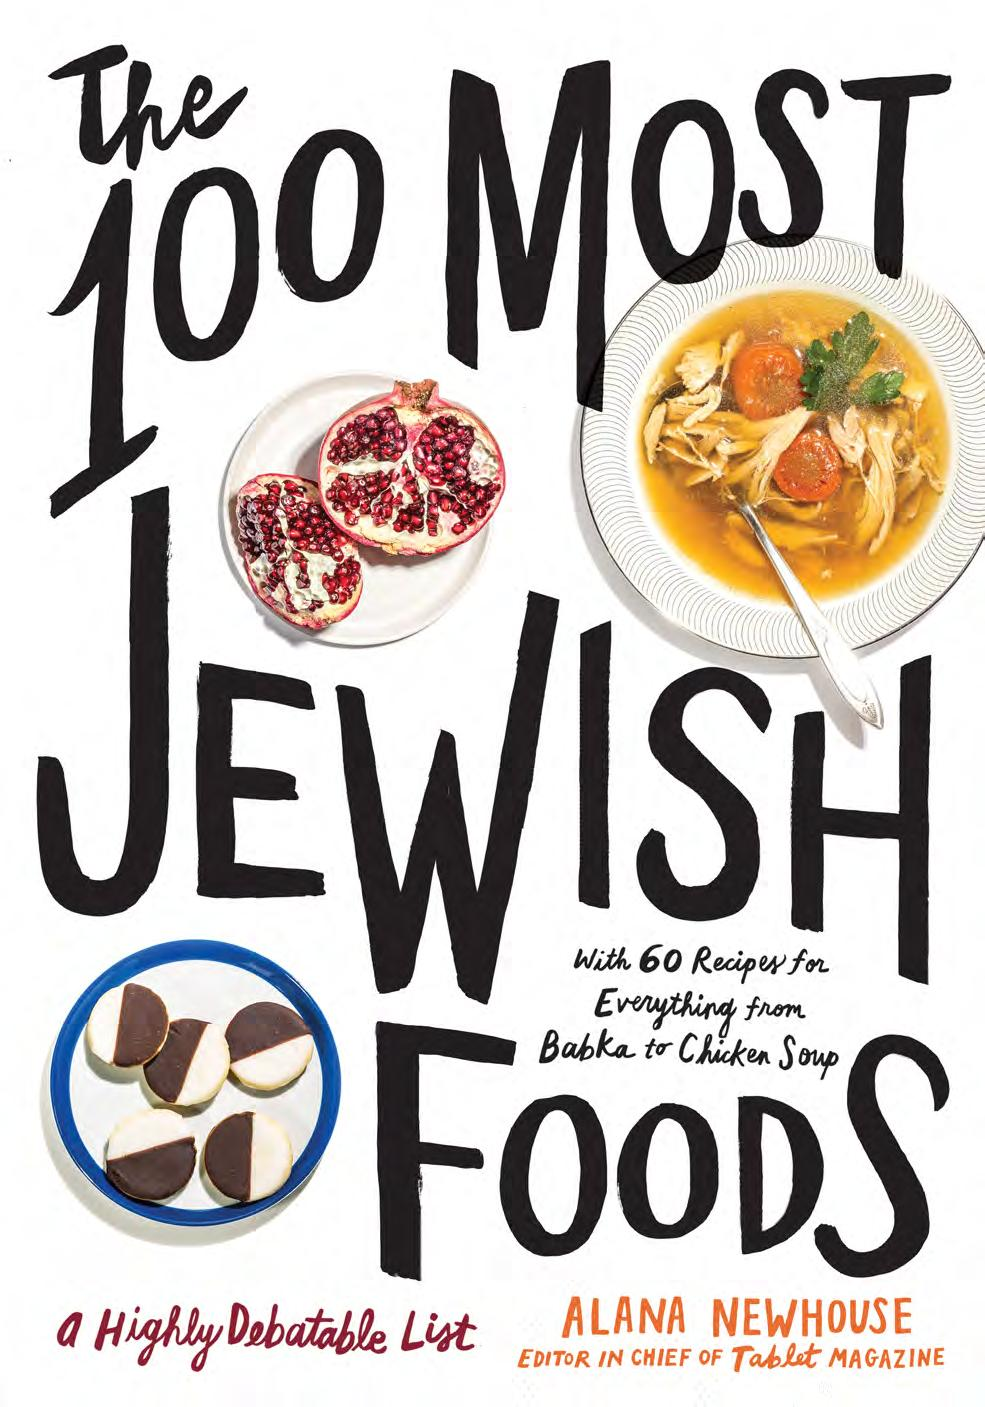 Joan nathan' s jewish holiday cookbook pdf free download windows 7